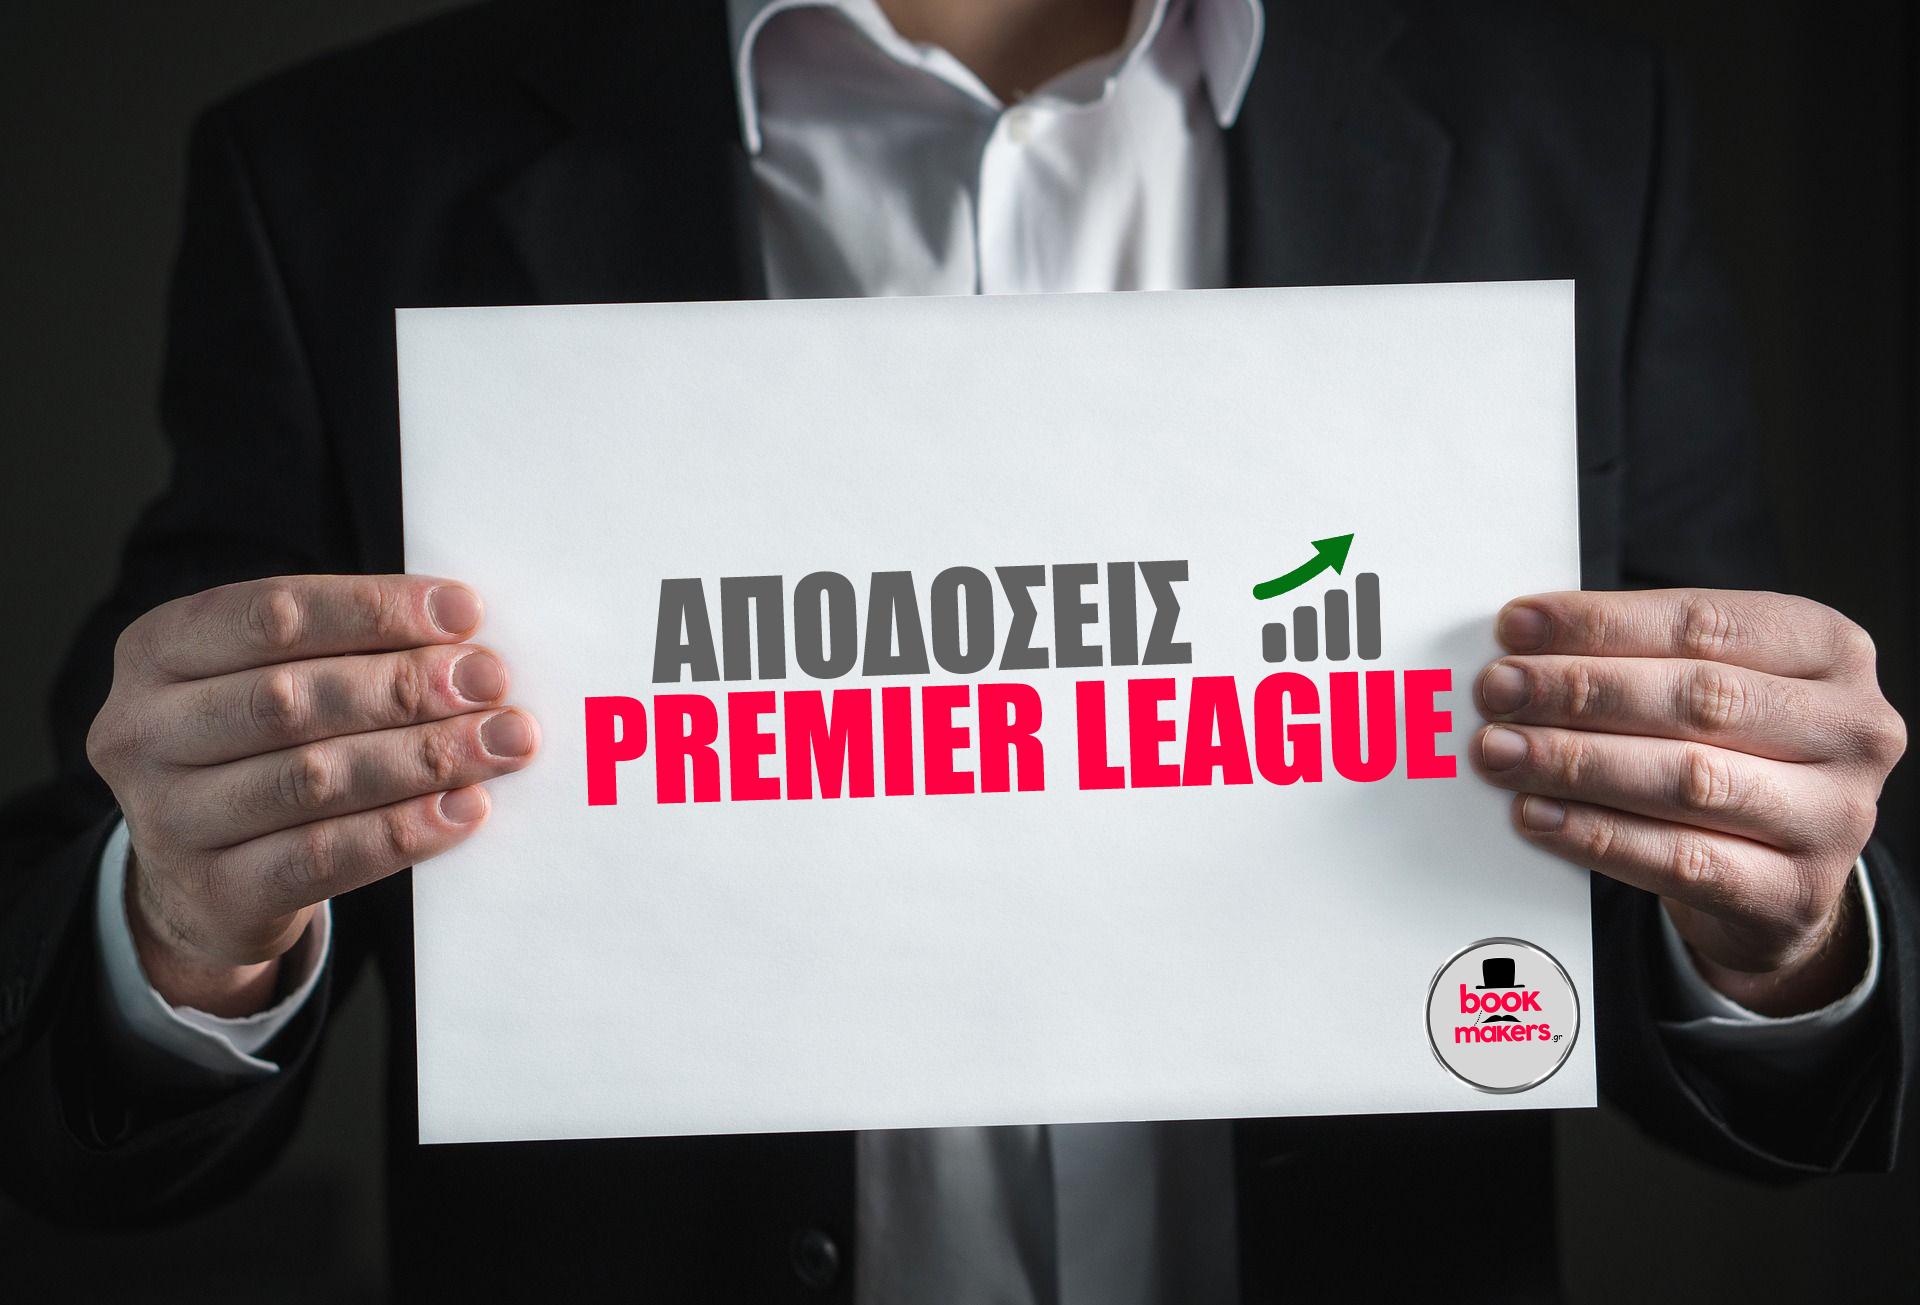 premier league apodoseis